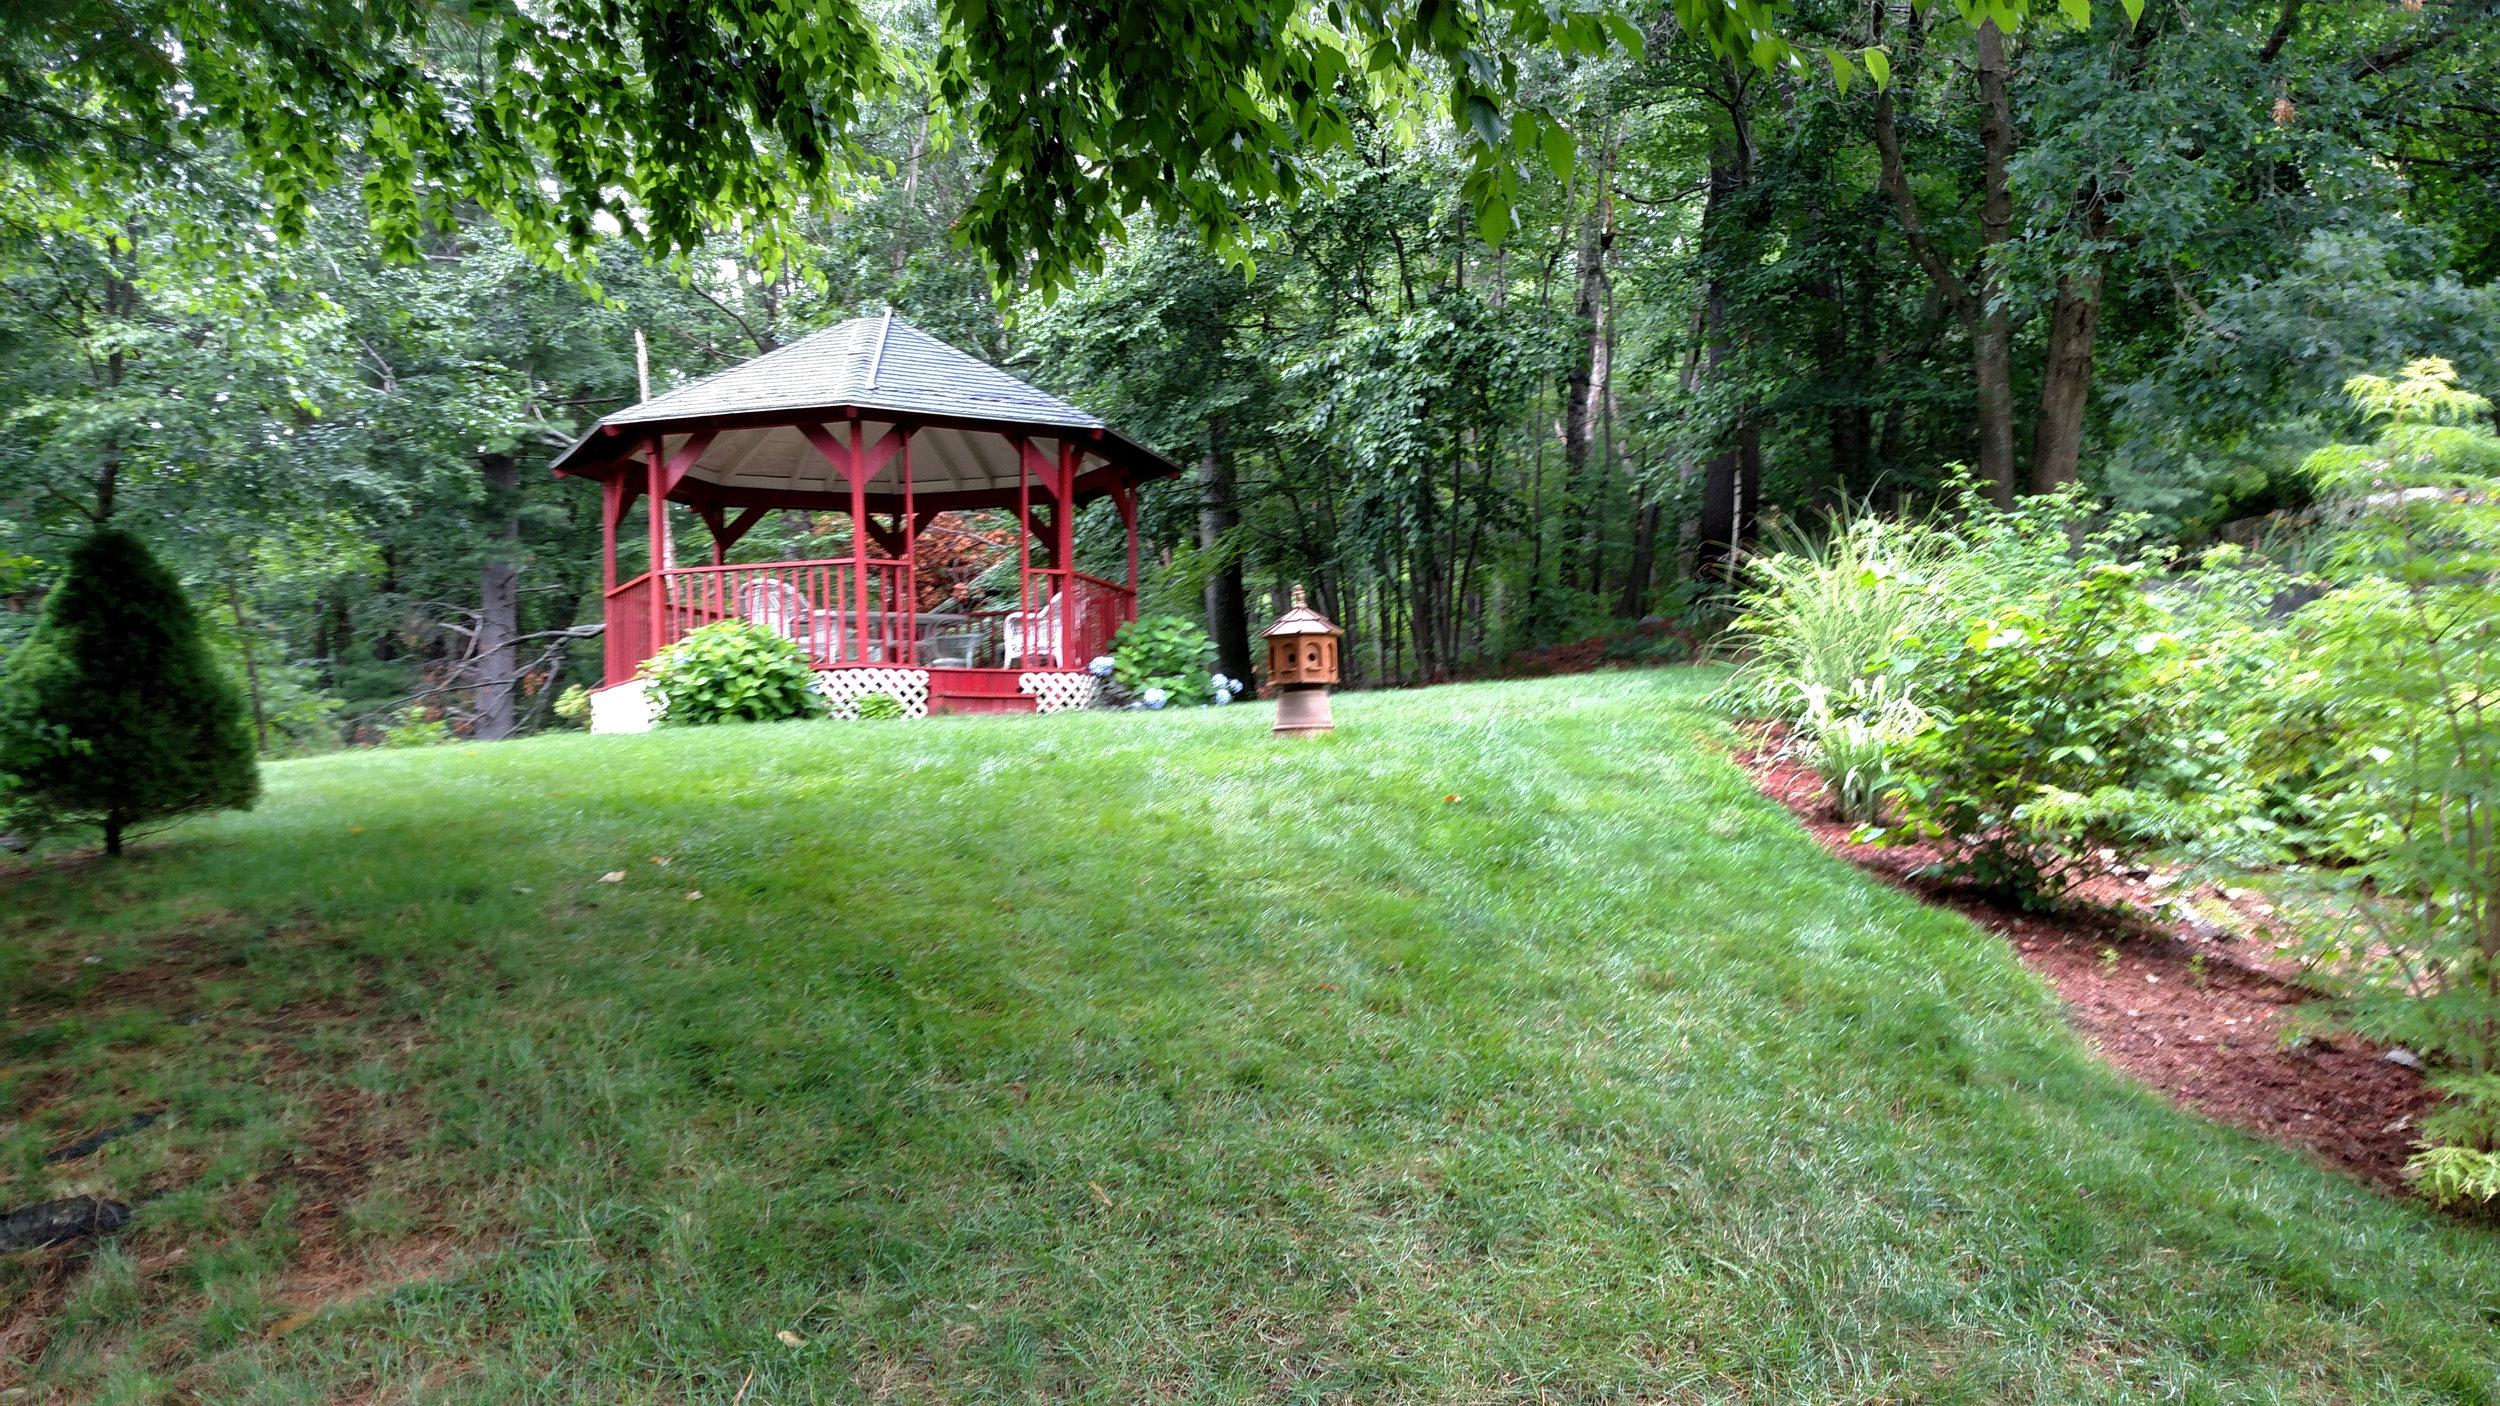 7-20-18 Shapiro Garden 18.jpg